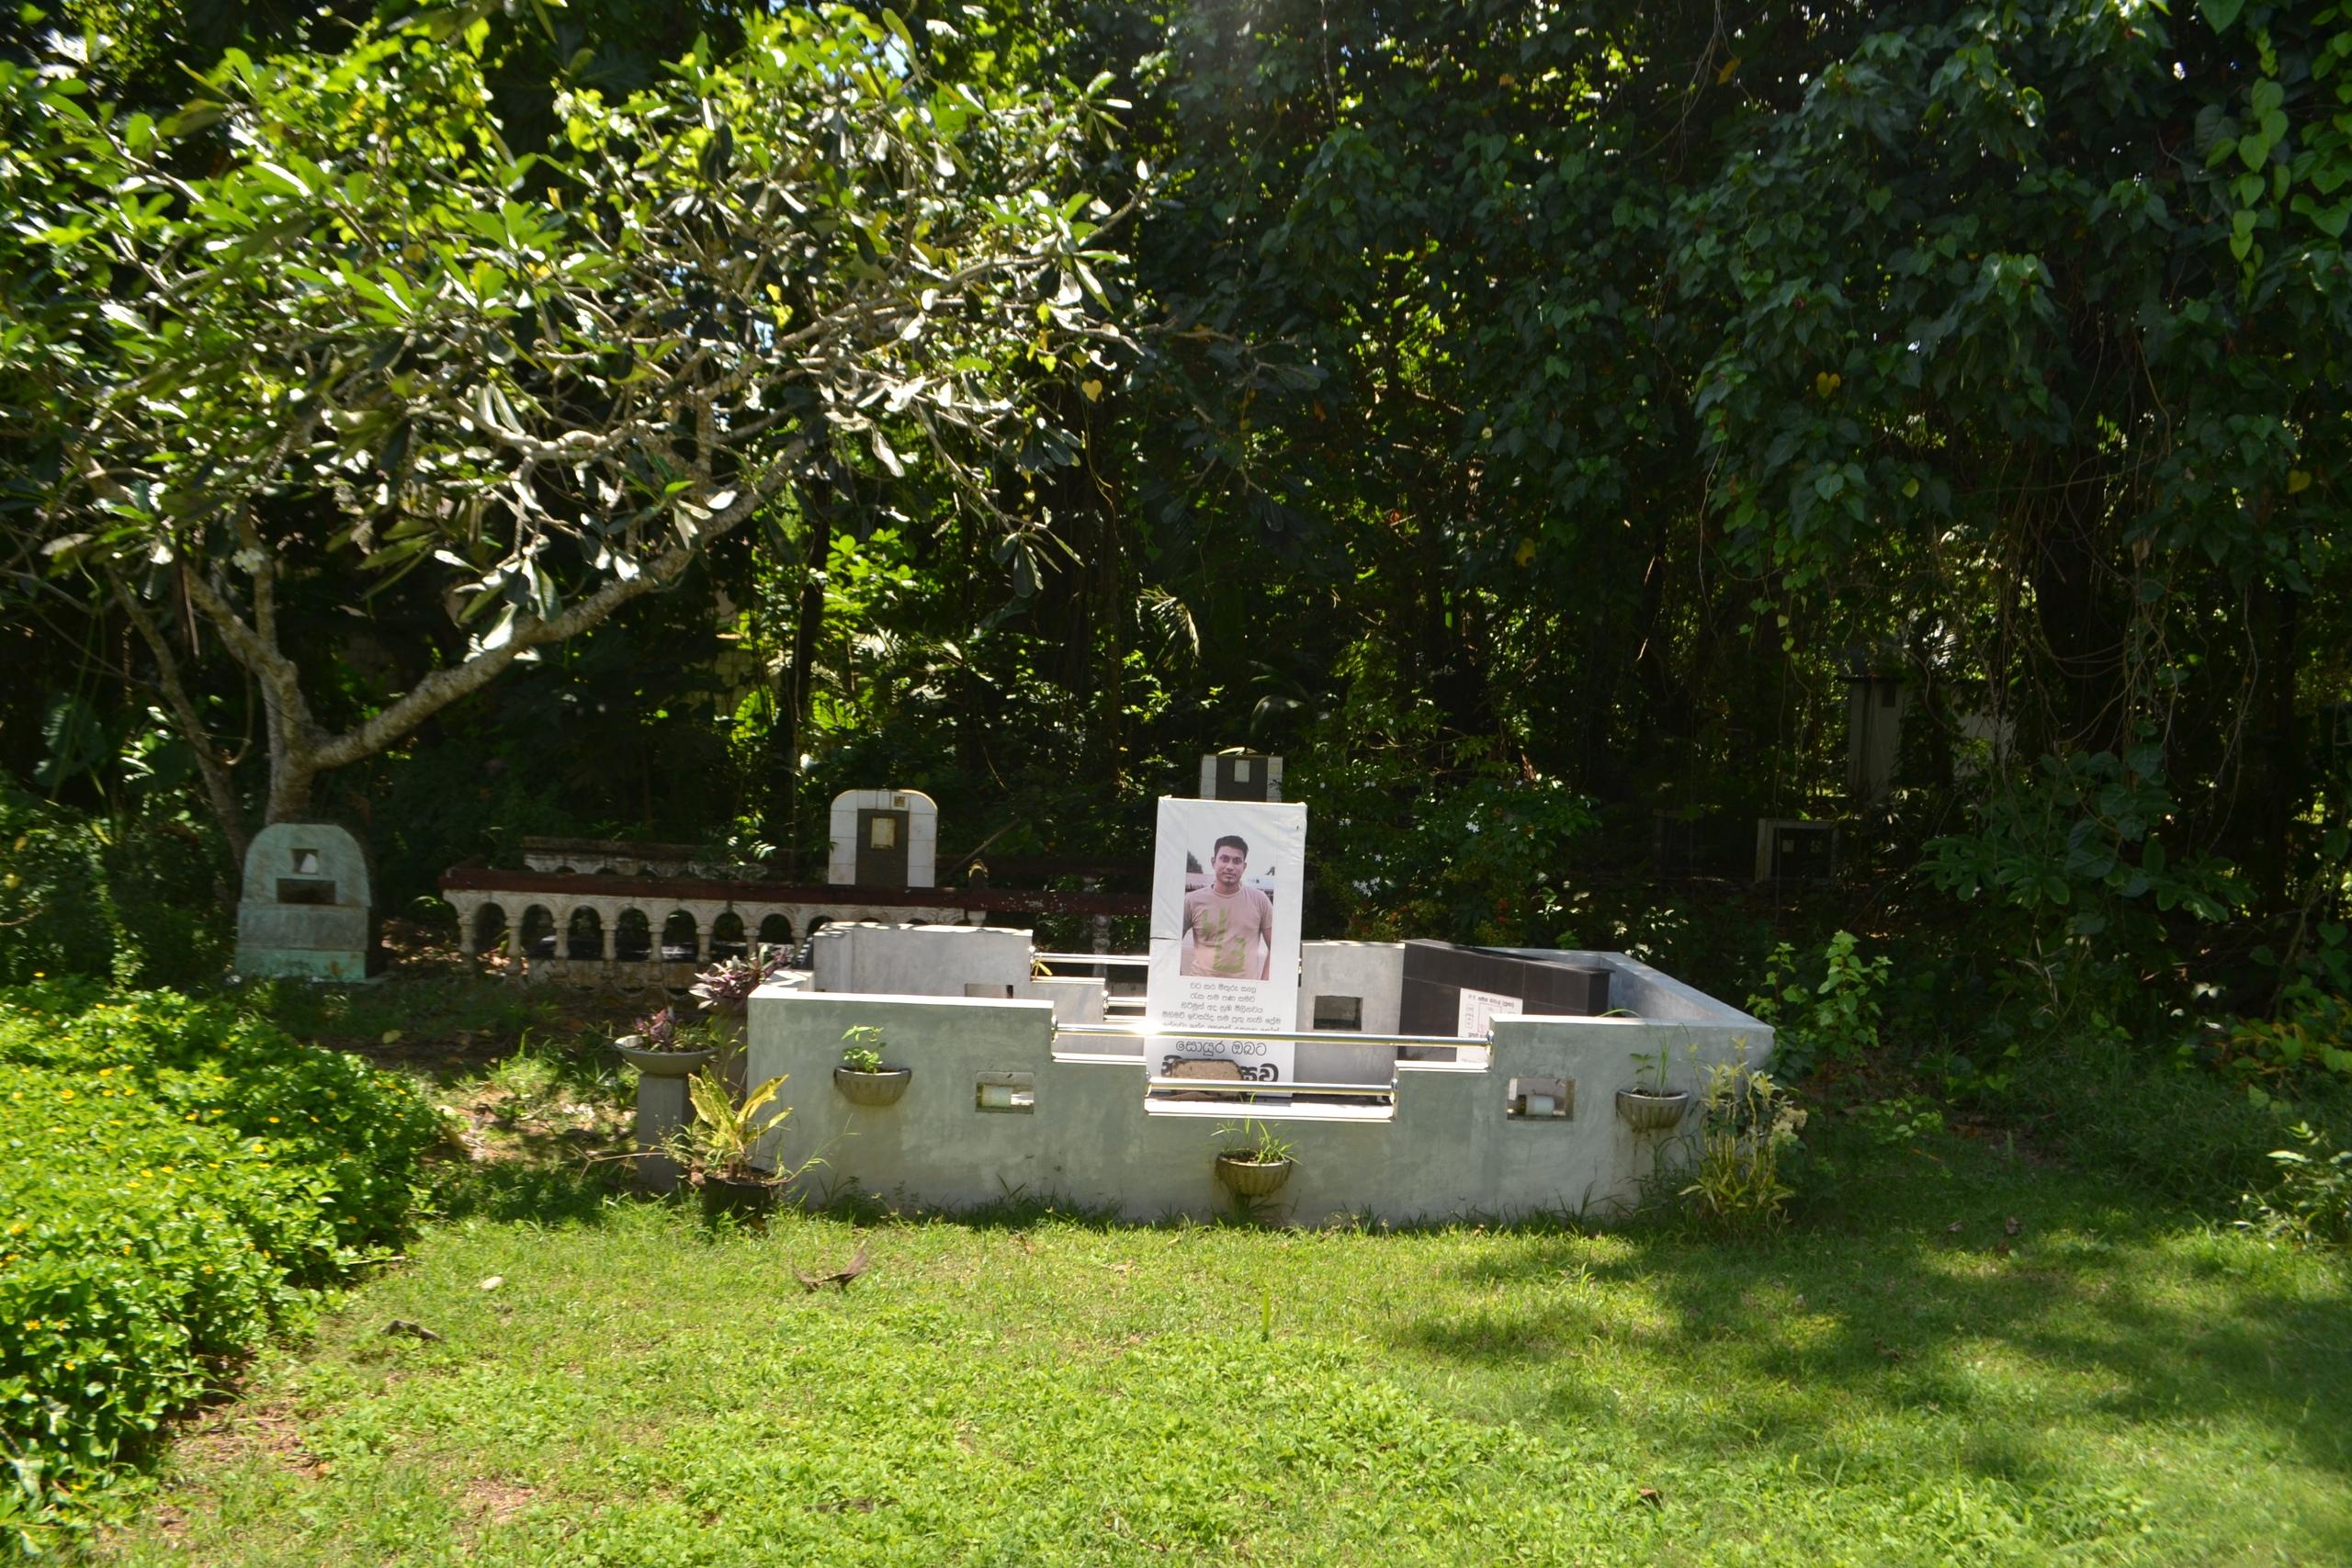 Шри Ланка (фото) - Страница 2 O4iHRkUcwyY